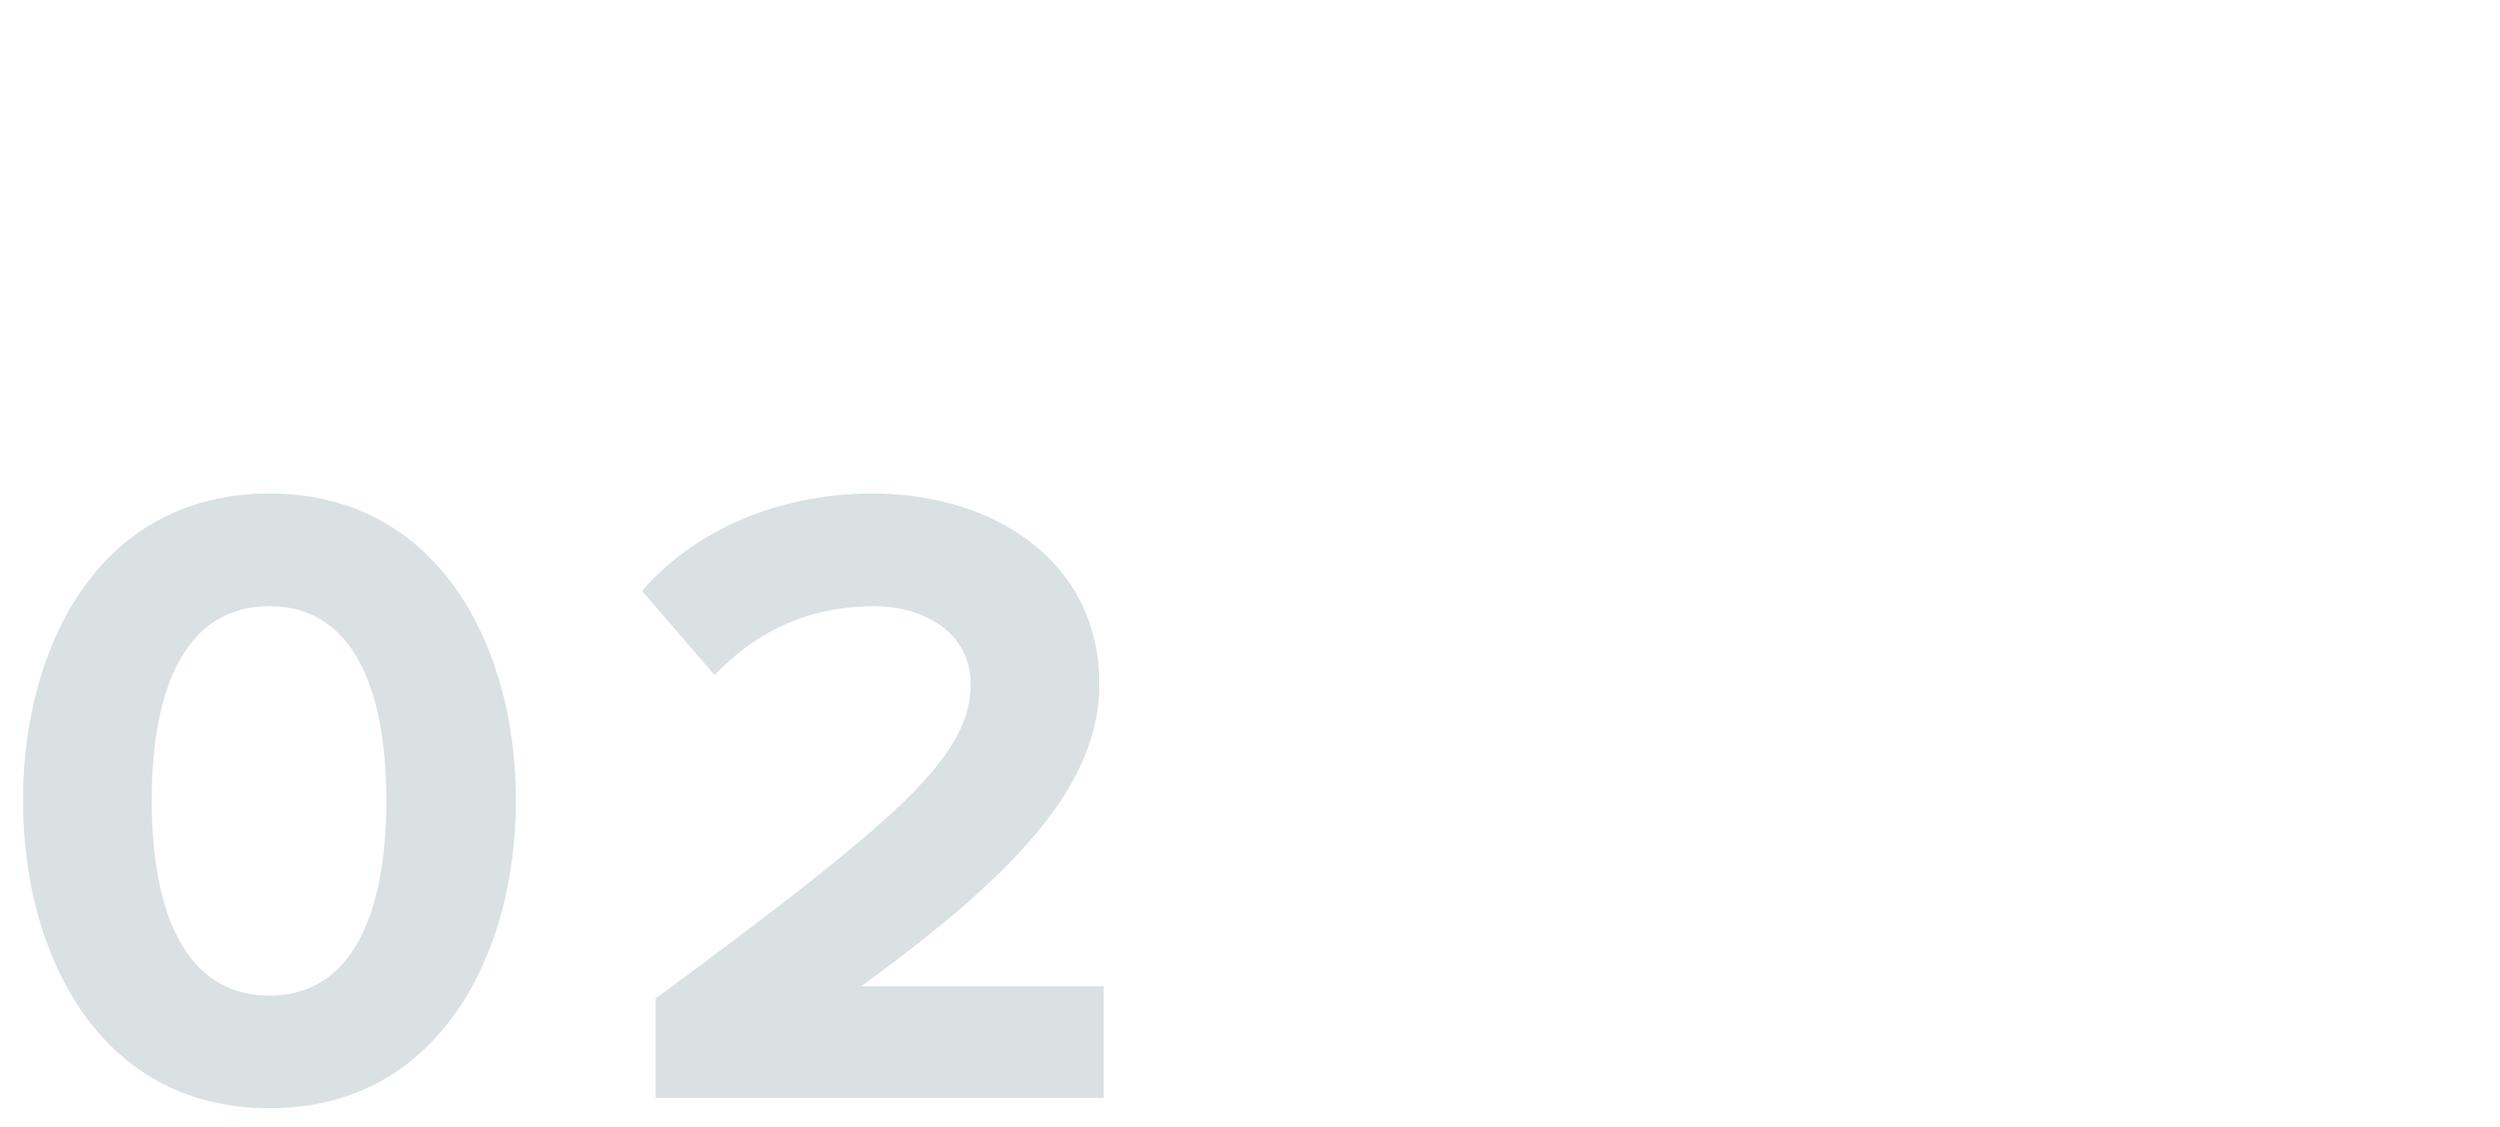 Website Numbers-02.png